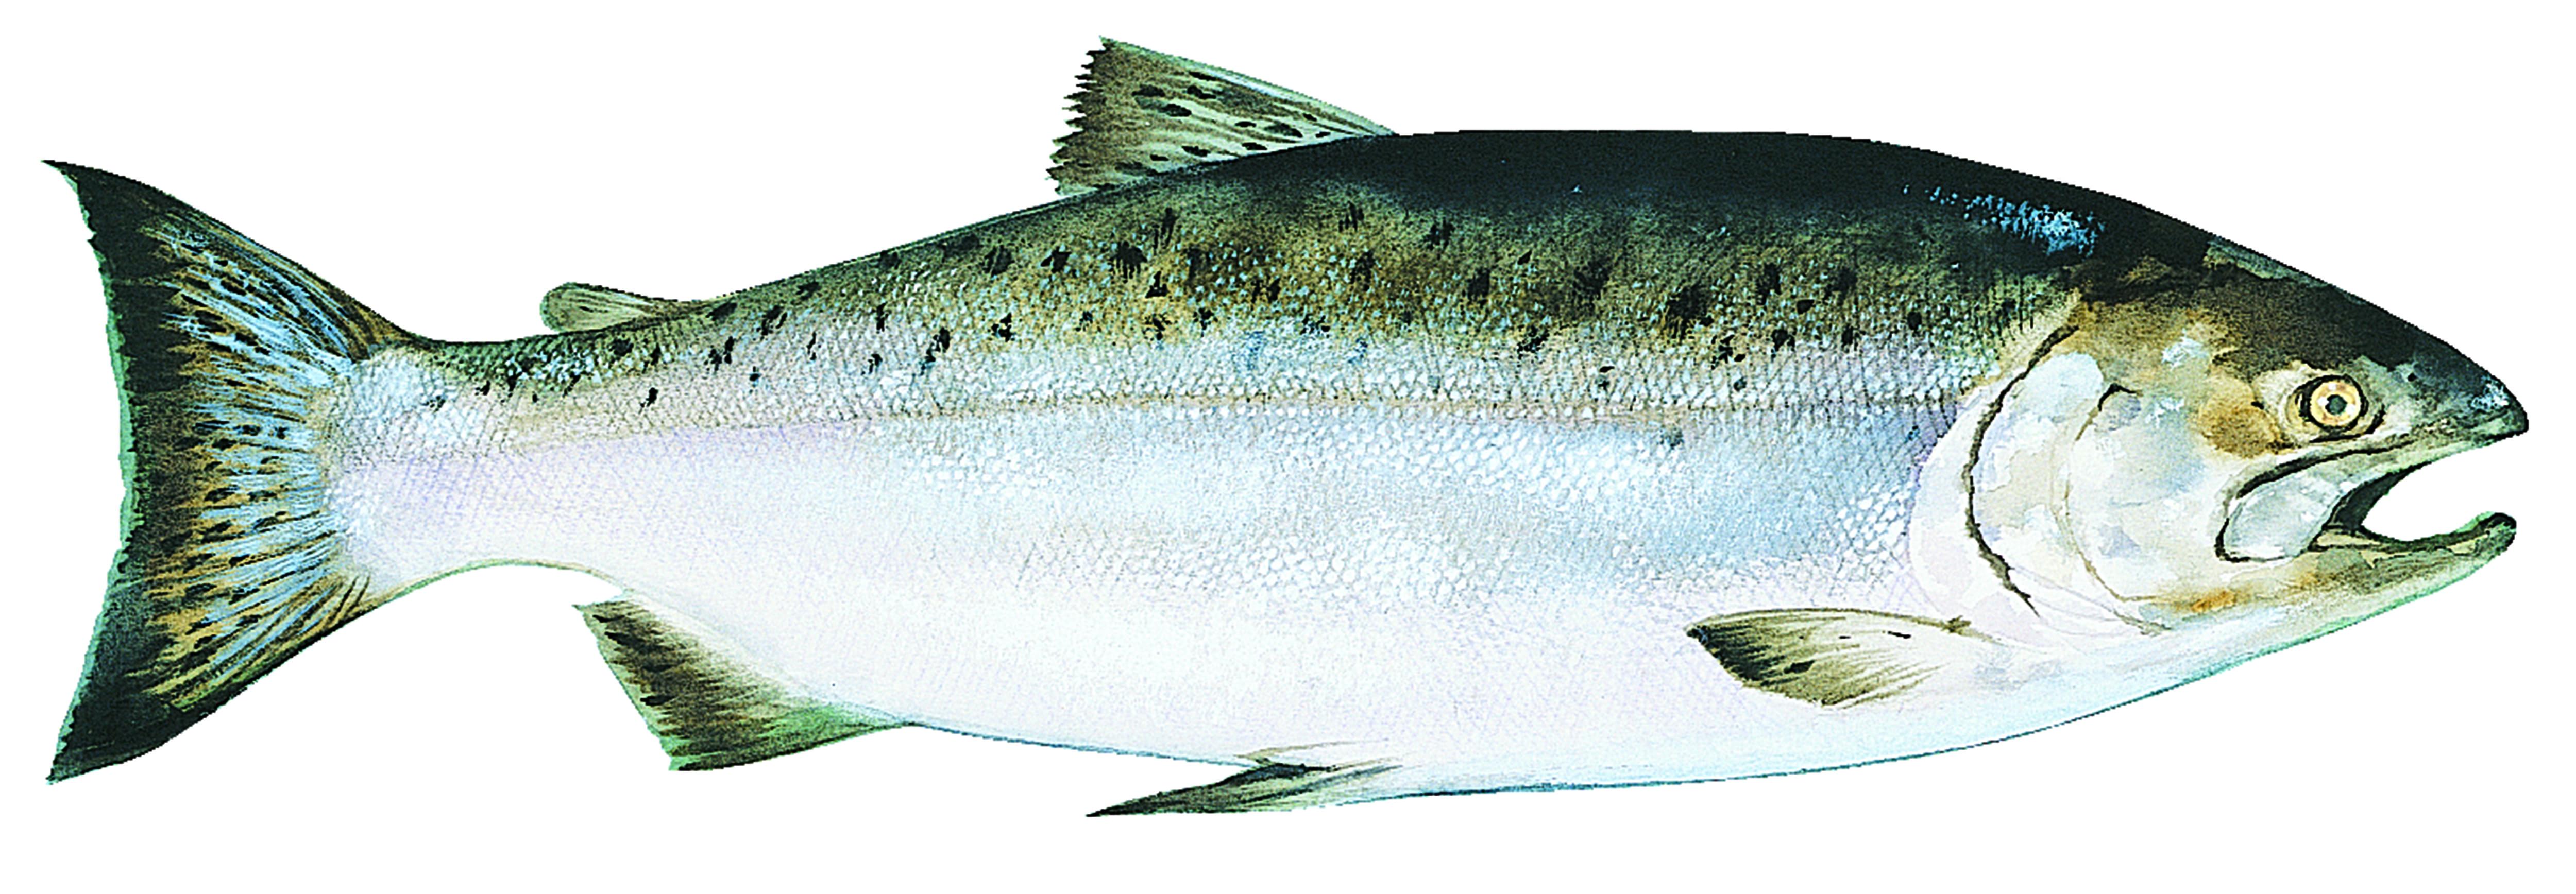 King salmon Wallpapers